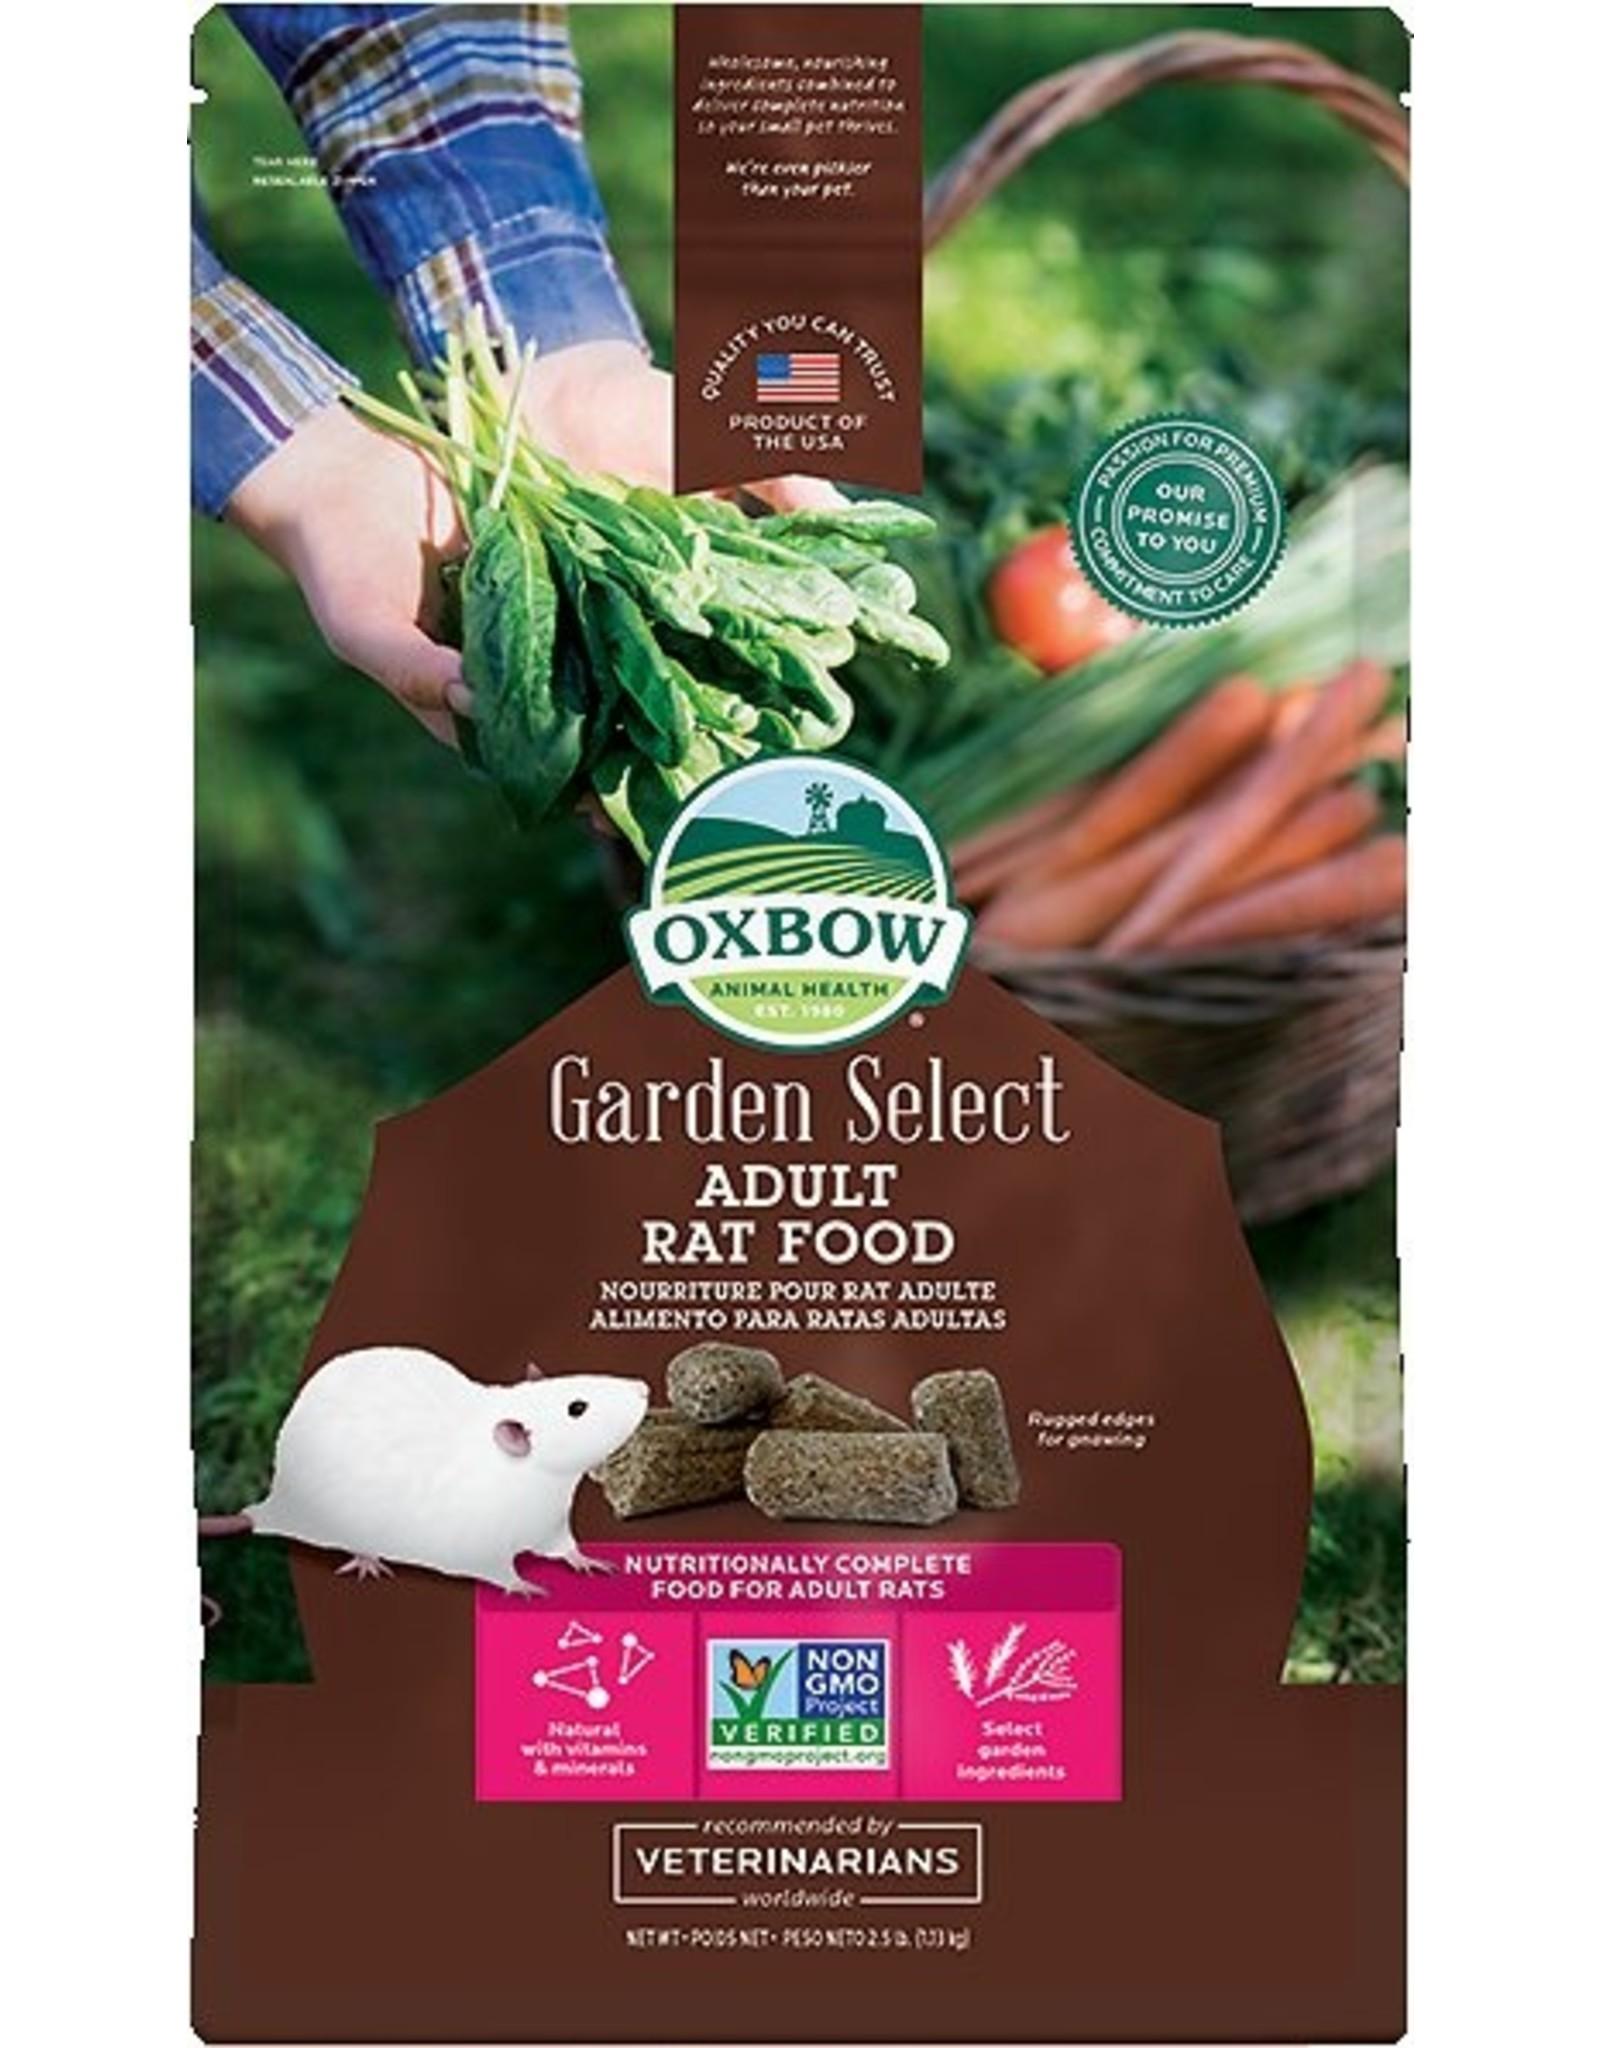 Oxbow Animal Health OXBOW GARDEN SELECT ADULT RAT FOOD 2.5LB